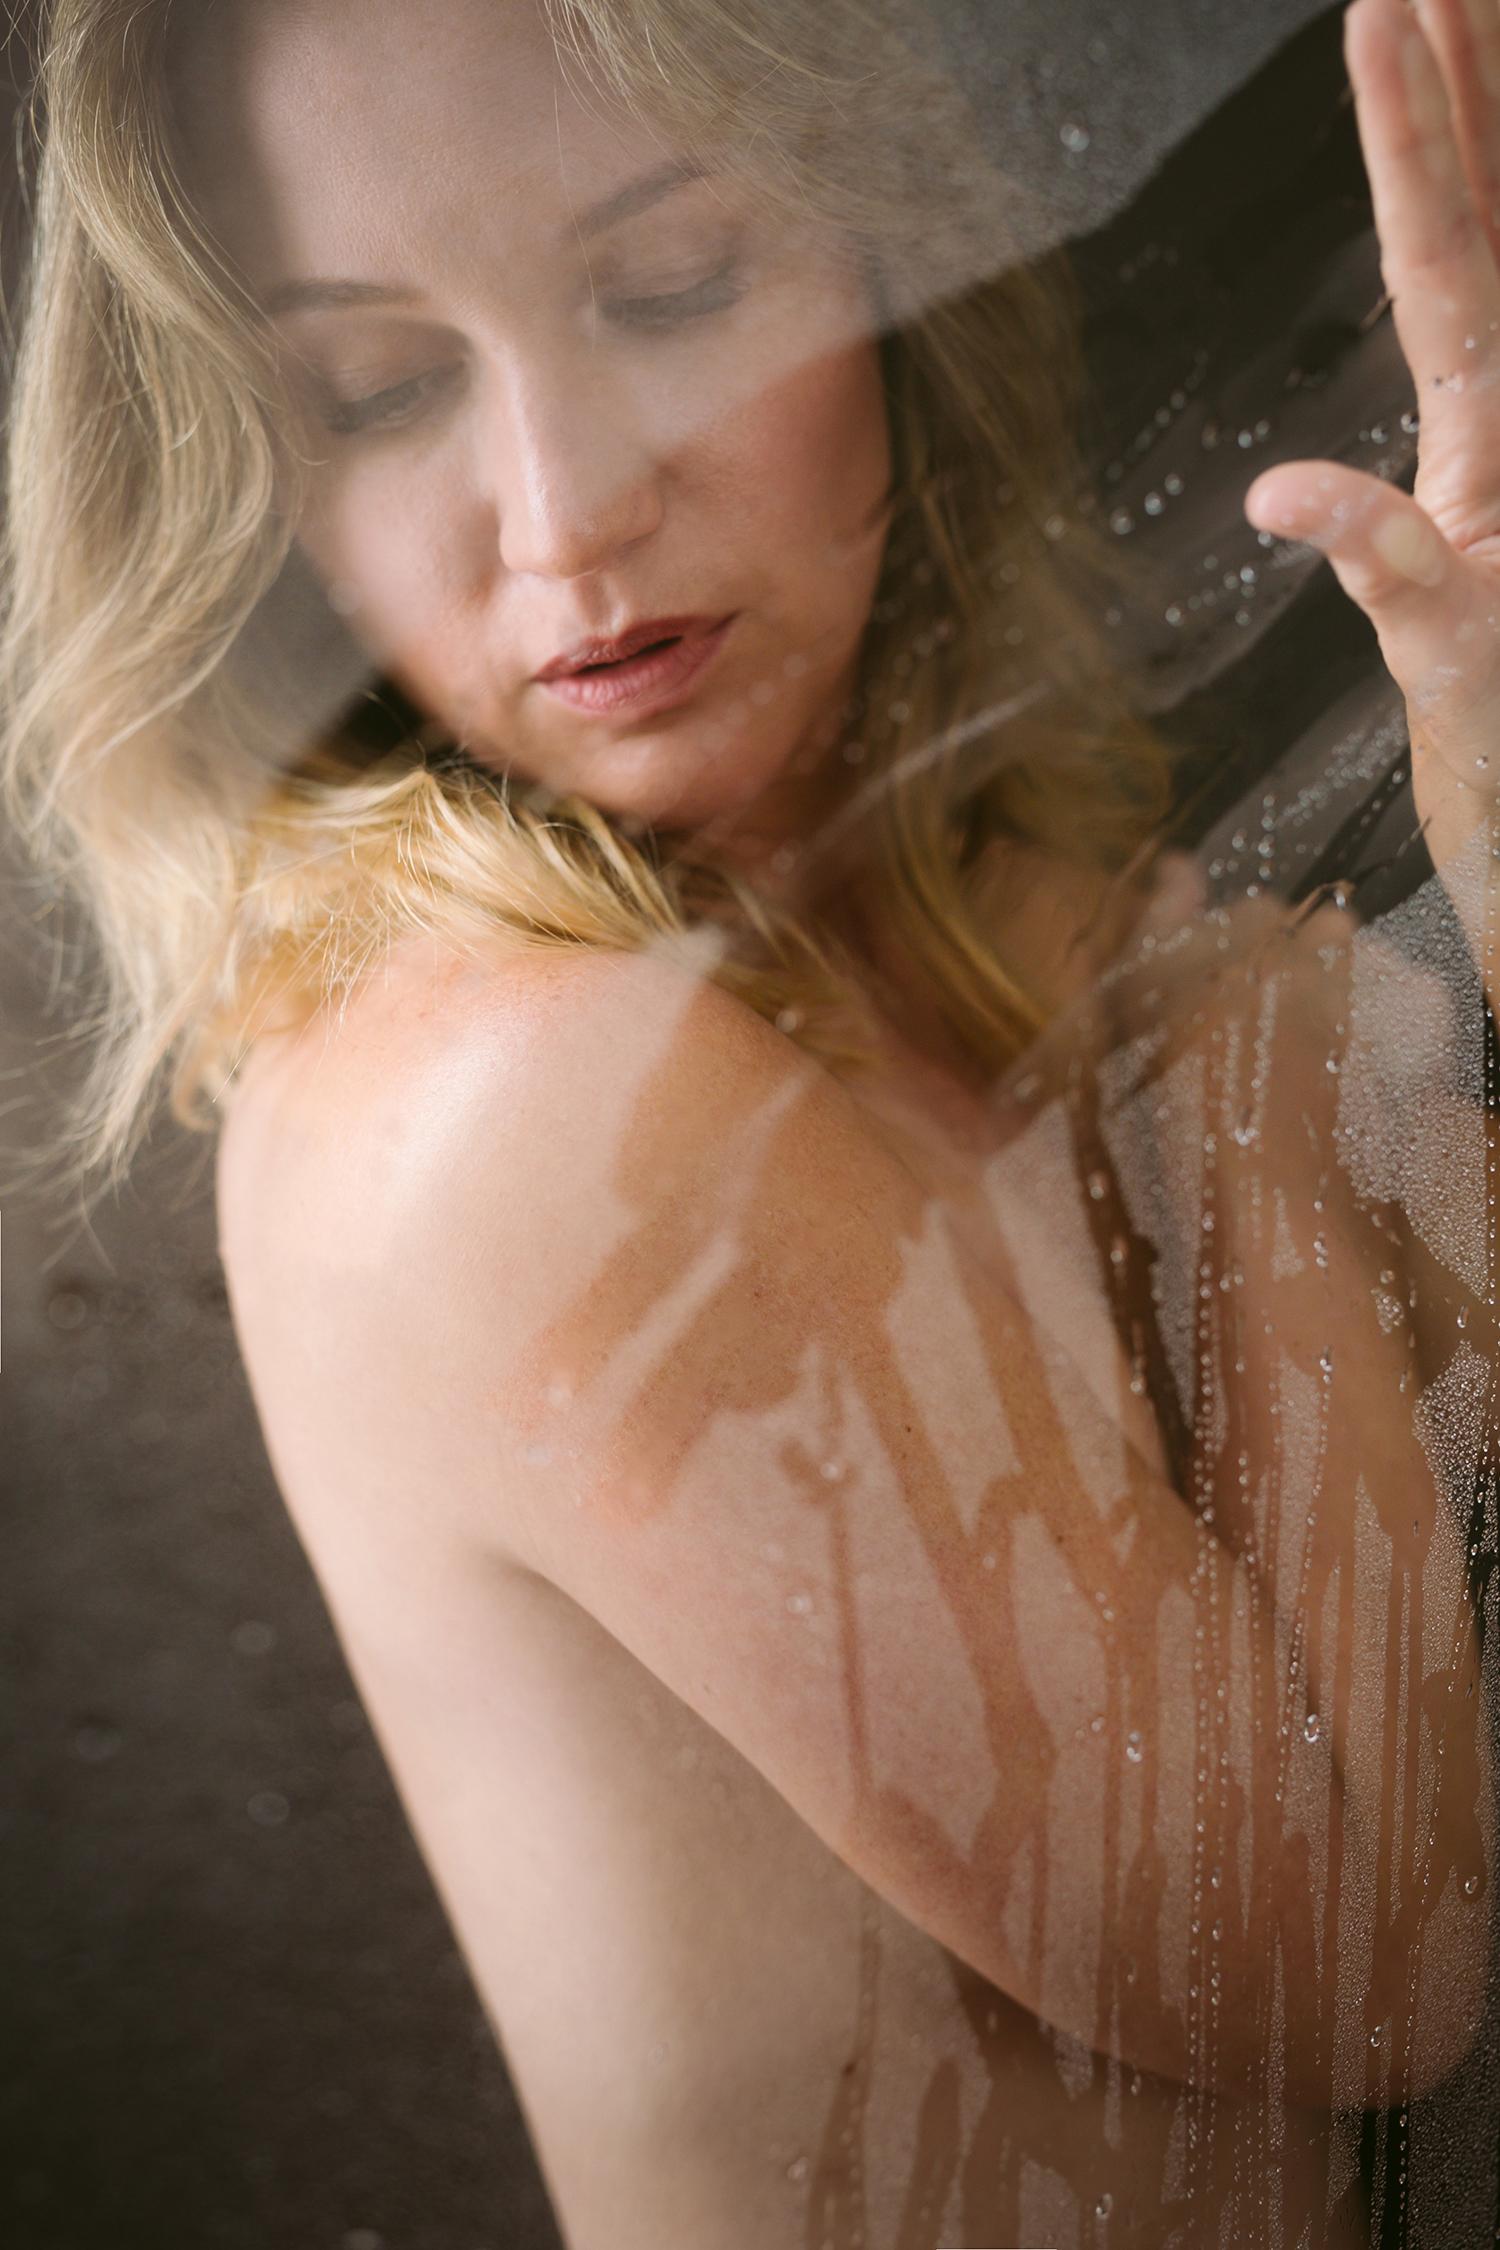 atx-austin-boudoir-shower-artistic-kbb-01.jpg